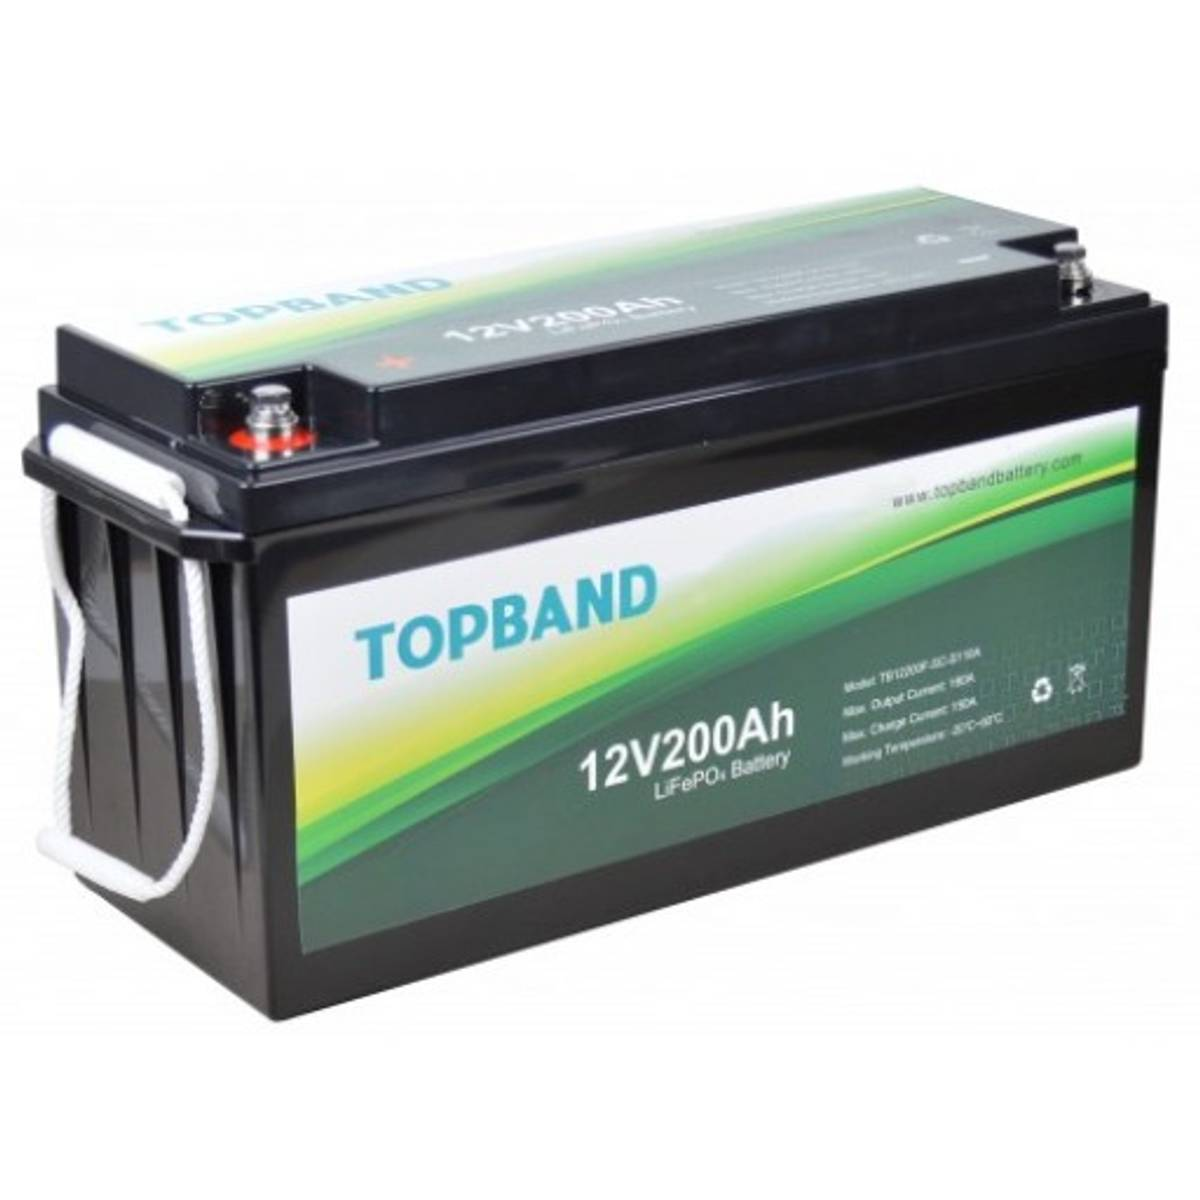 TOPBAND Lithium HEAT PRO - 12V 200AH - 200A BMS - Bluetooth